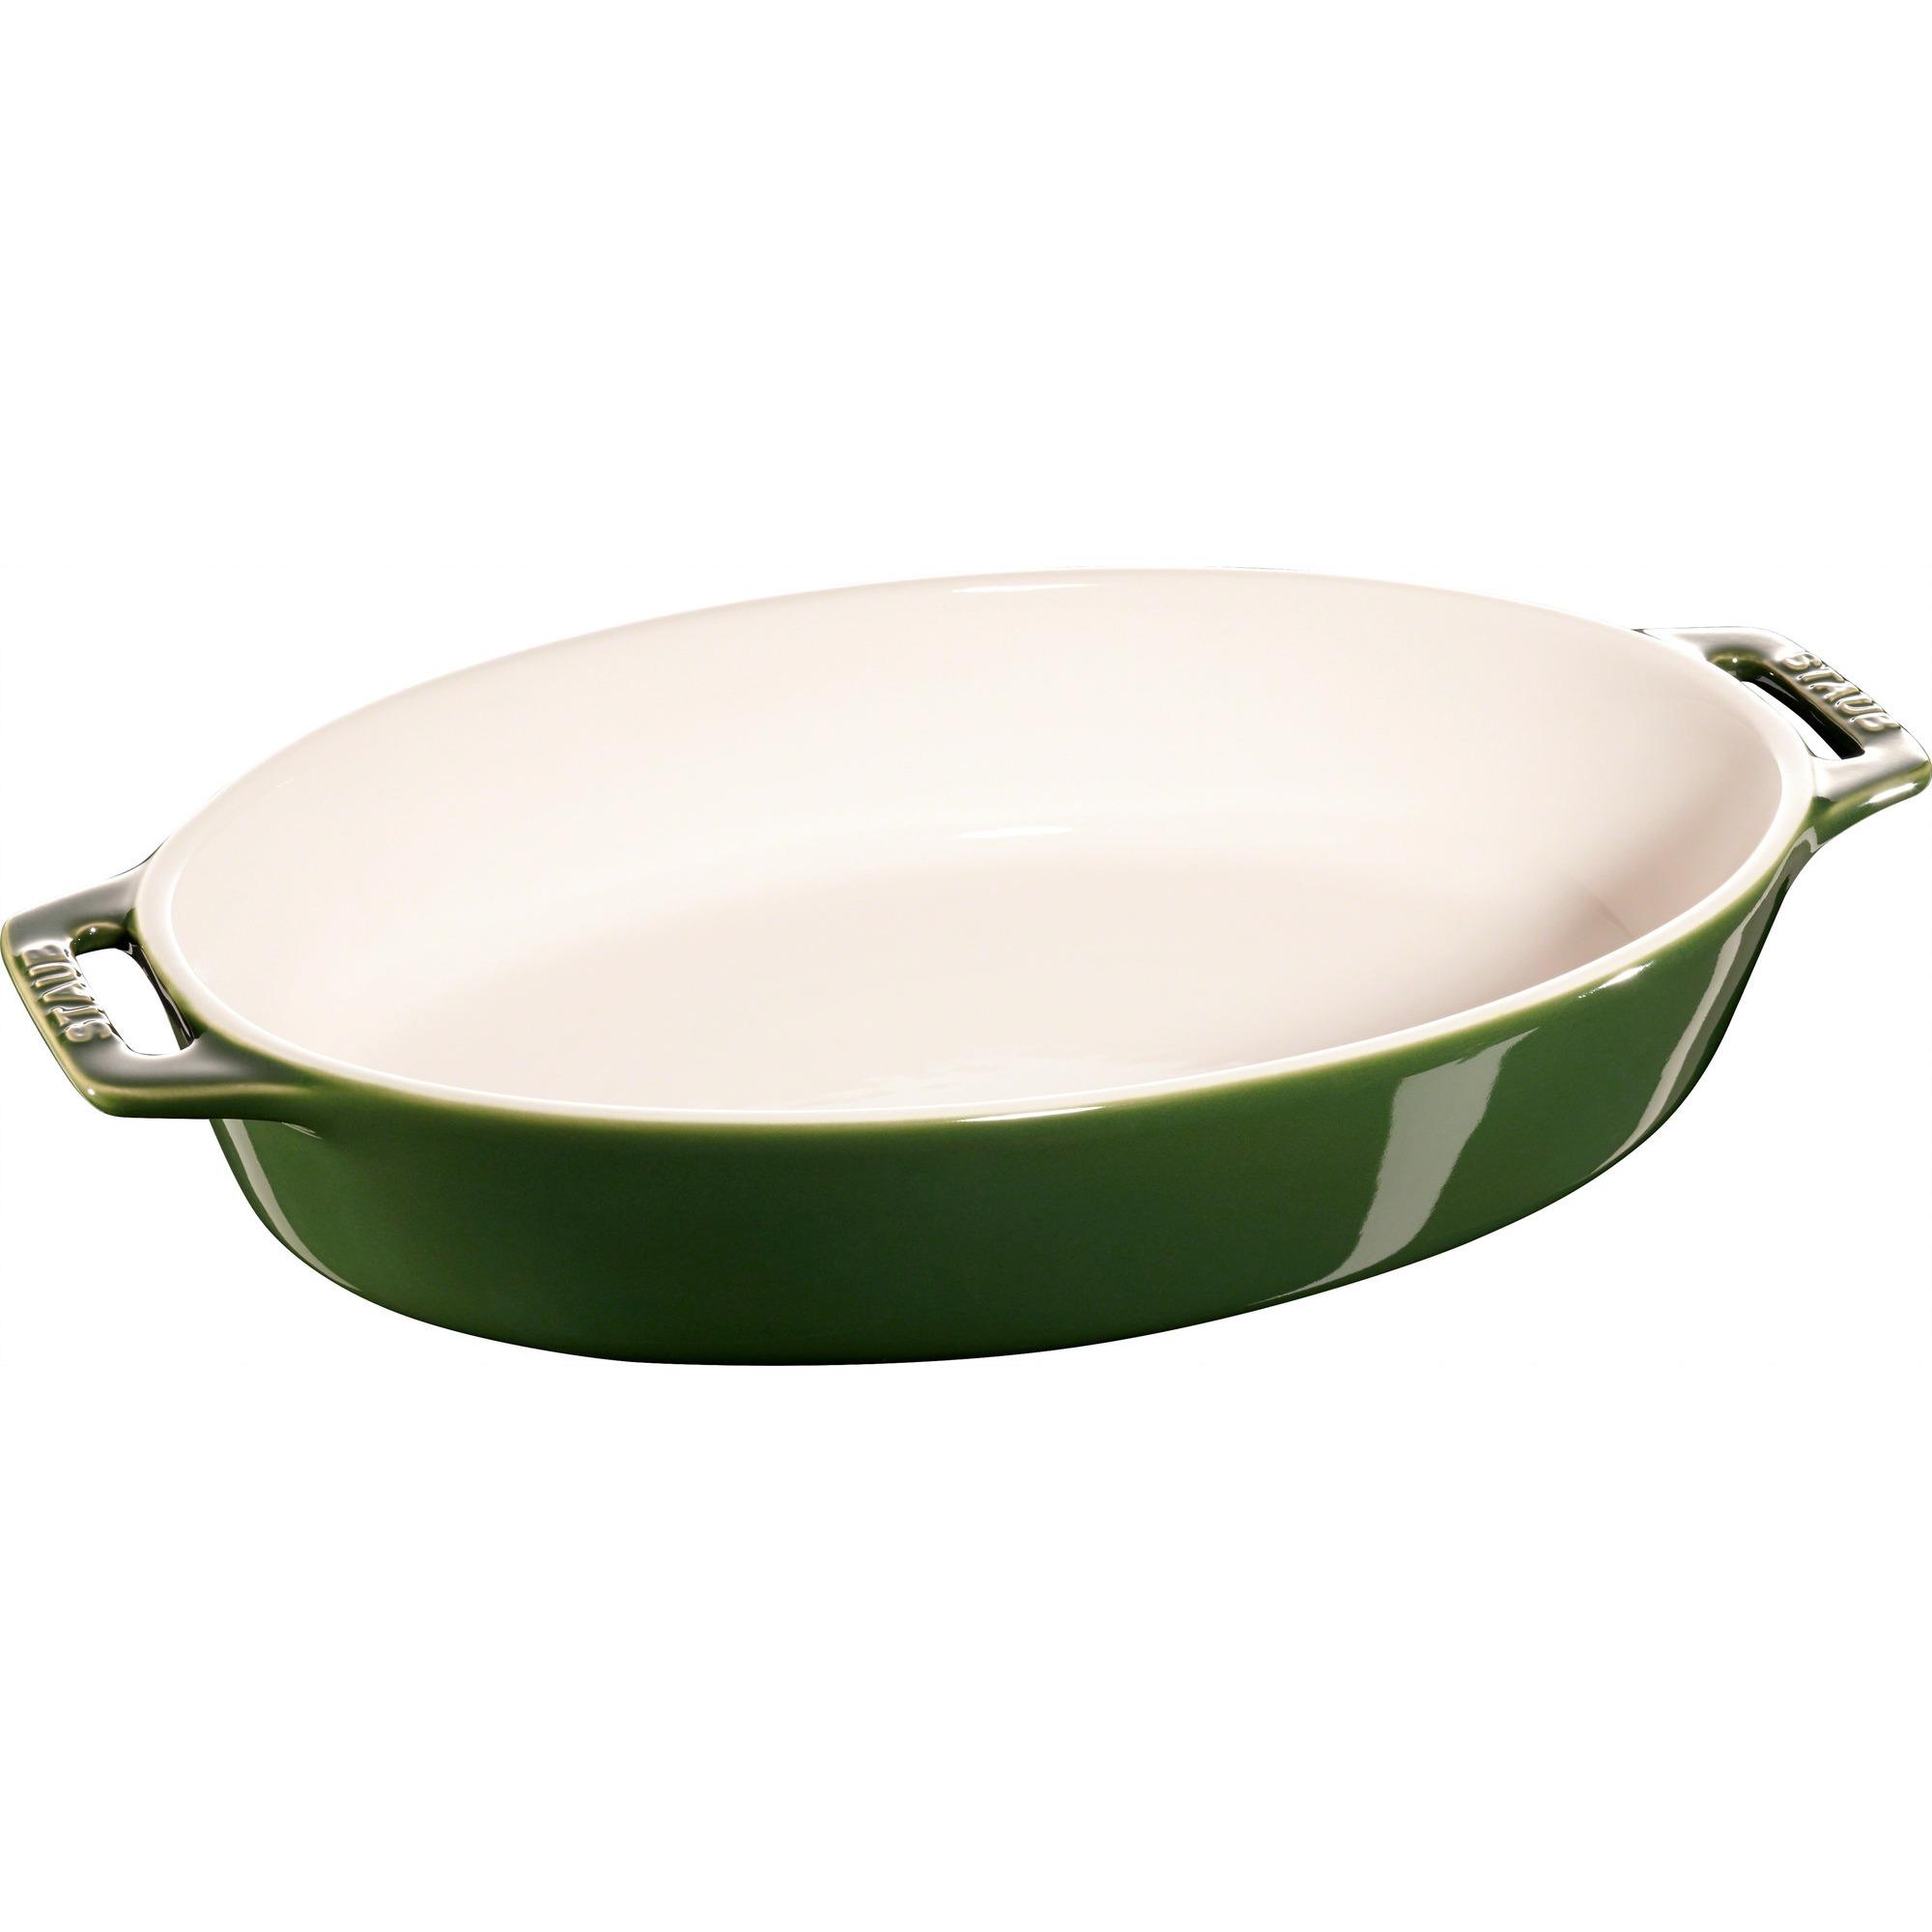 Staub Oval Form 29 cm Grön